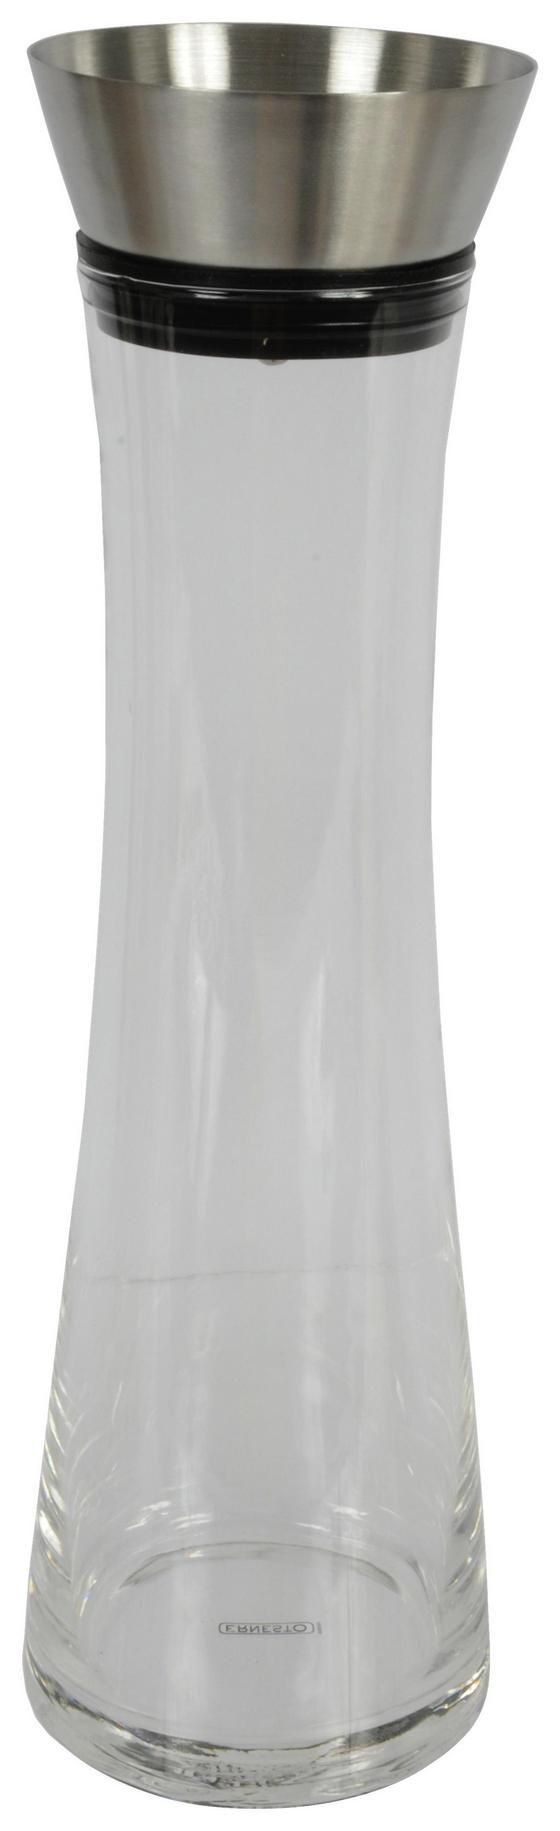 Wasserkaraffe Cuisine Elegance - Transparent/Alufarben, MODERN, Glas/Kunststoff (10/34,3cm)